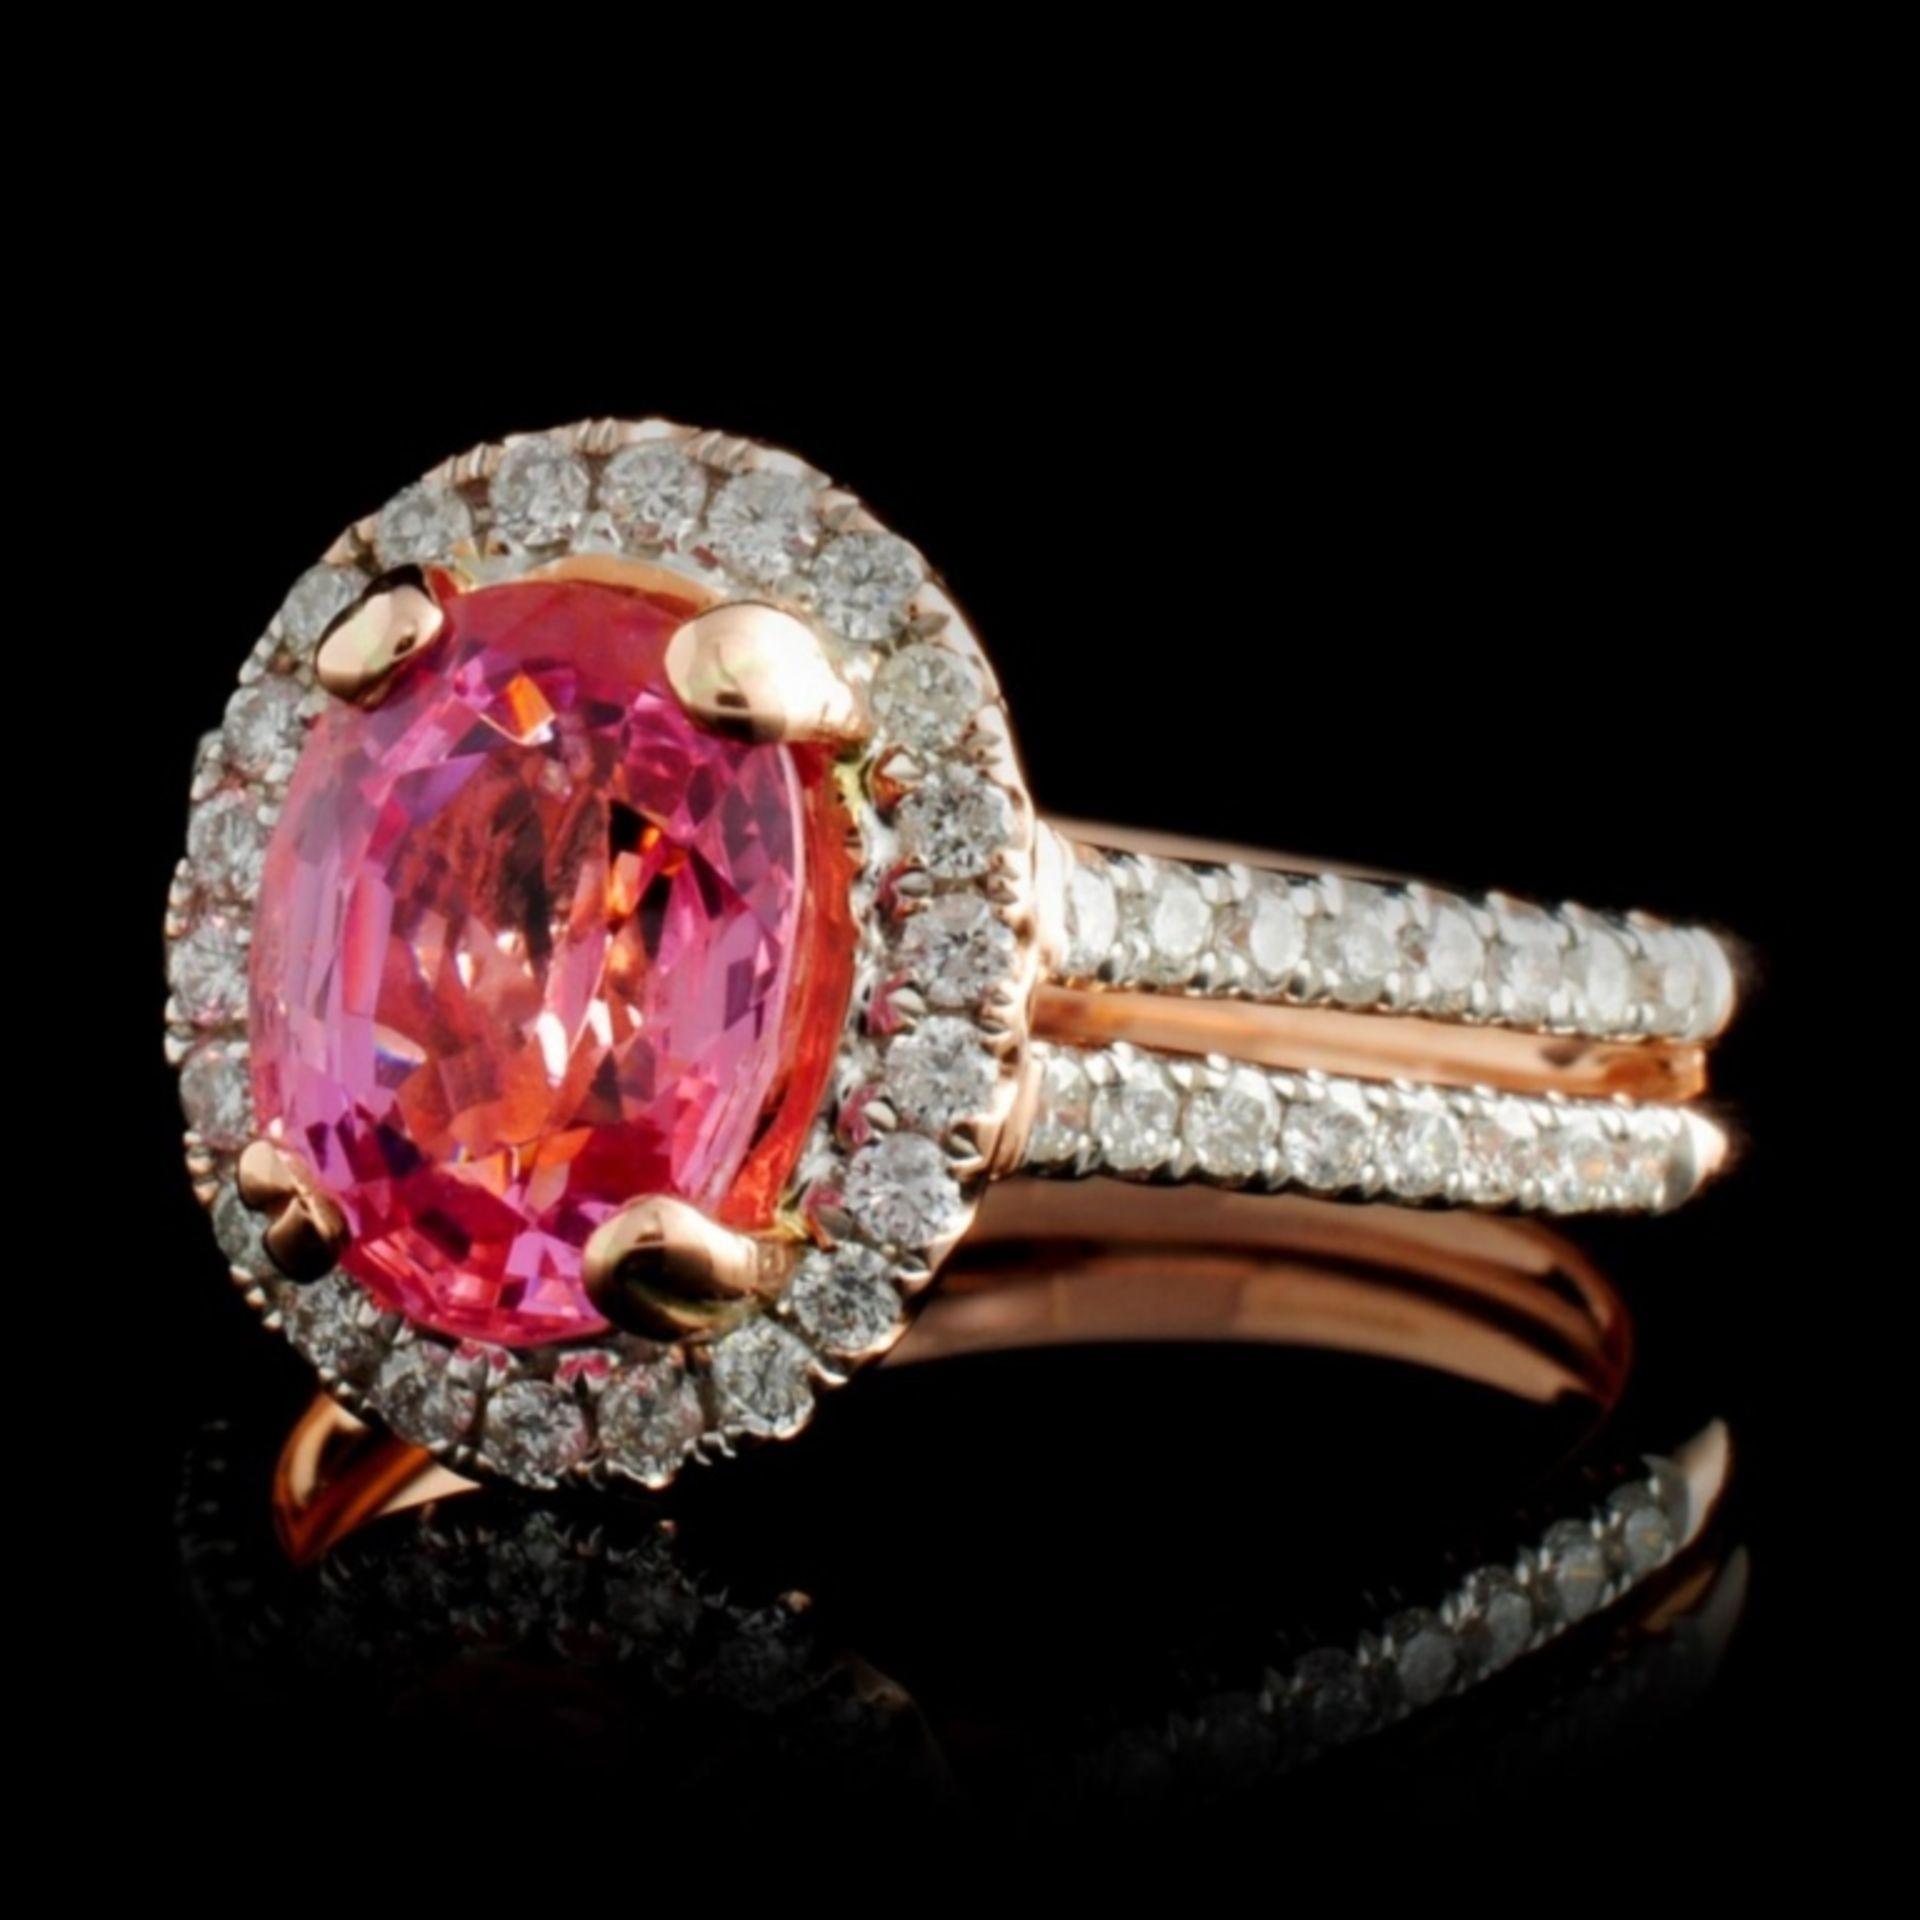 14K Rose Gold 2.40ct Spinel & 0.46ctw Diamond Ring - Image 2 of 4